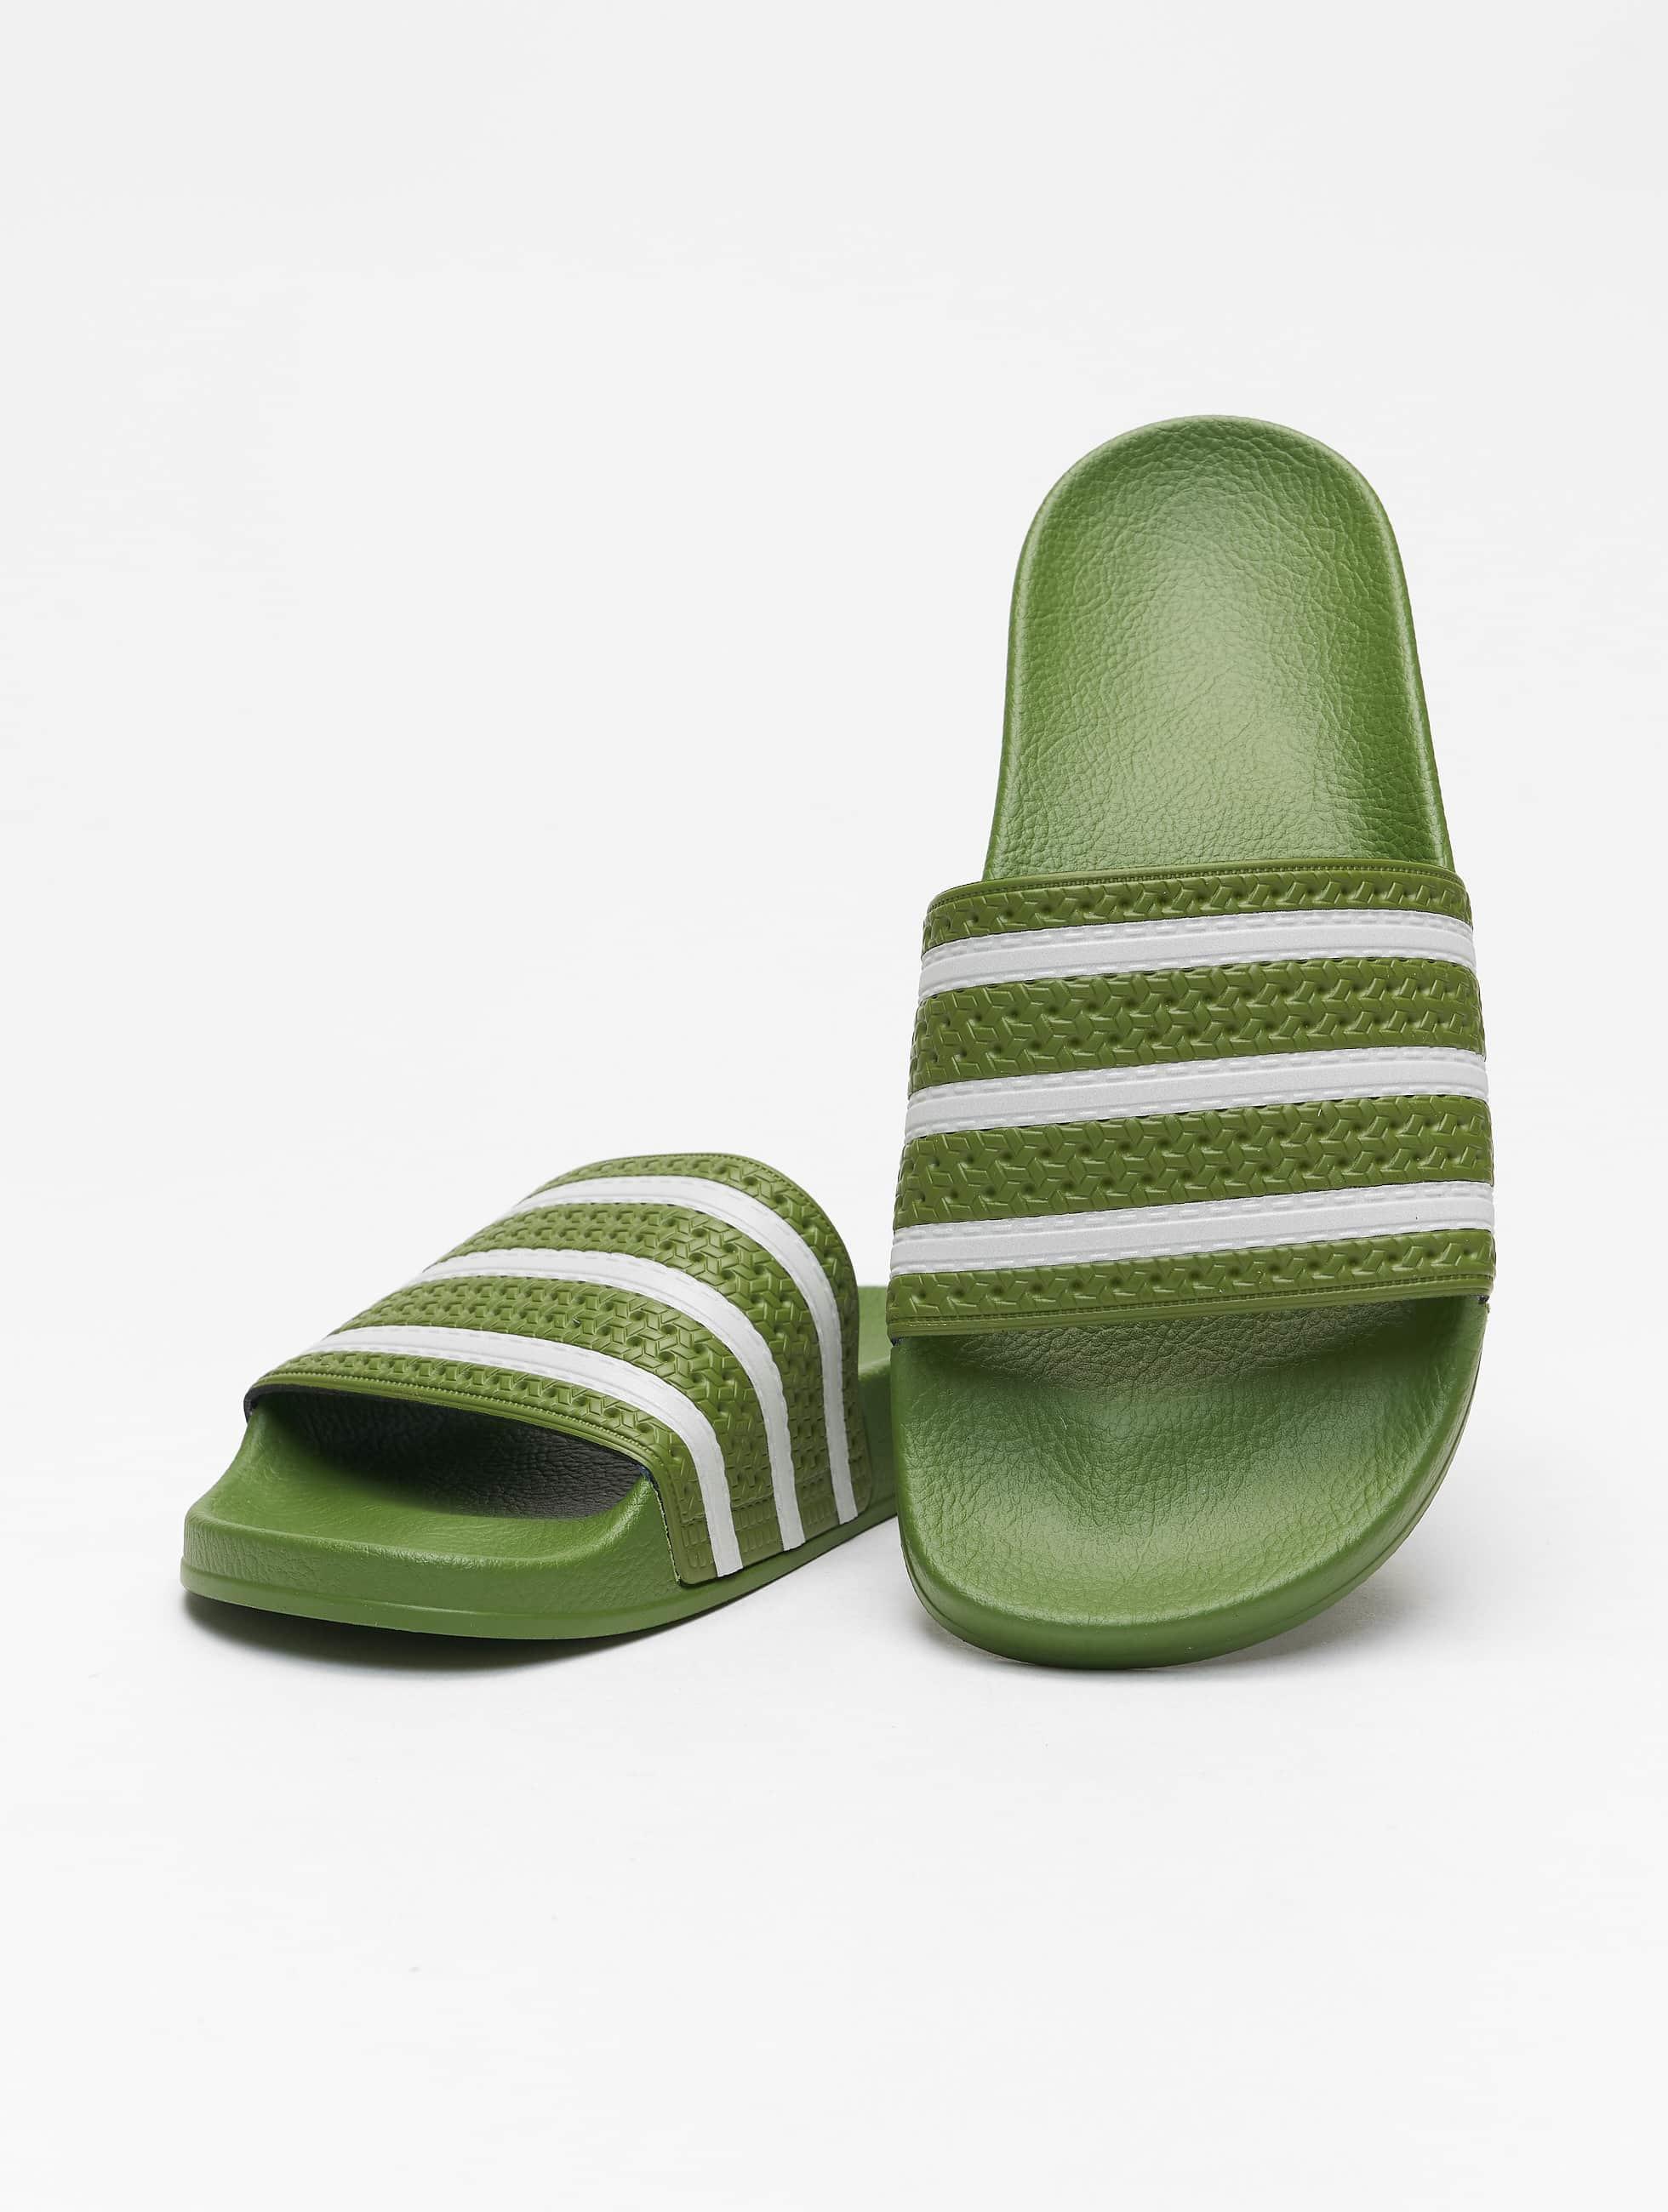 Adidas Originals Adilette Sandals Forest Green